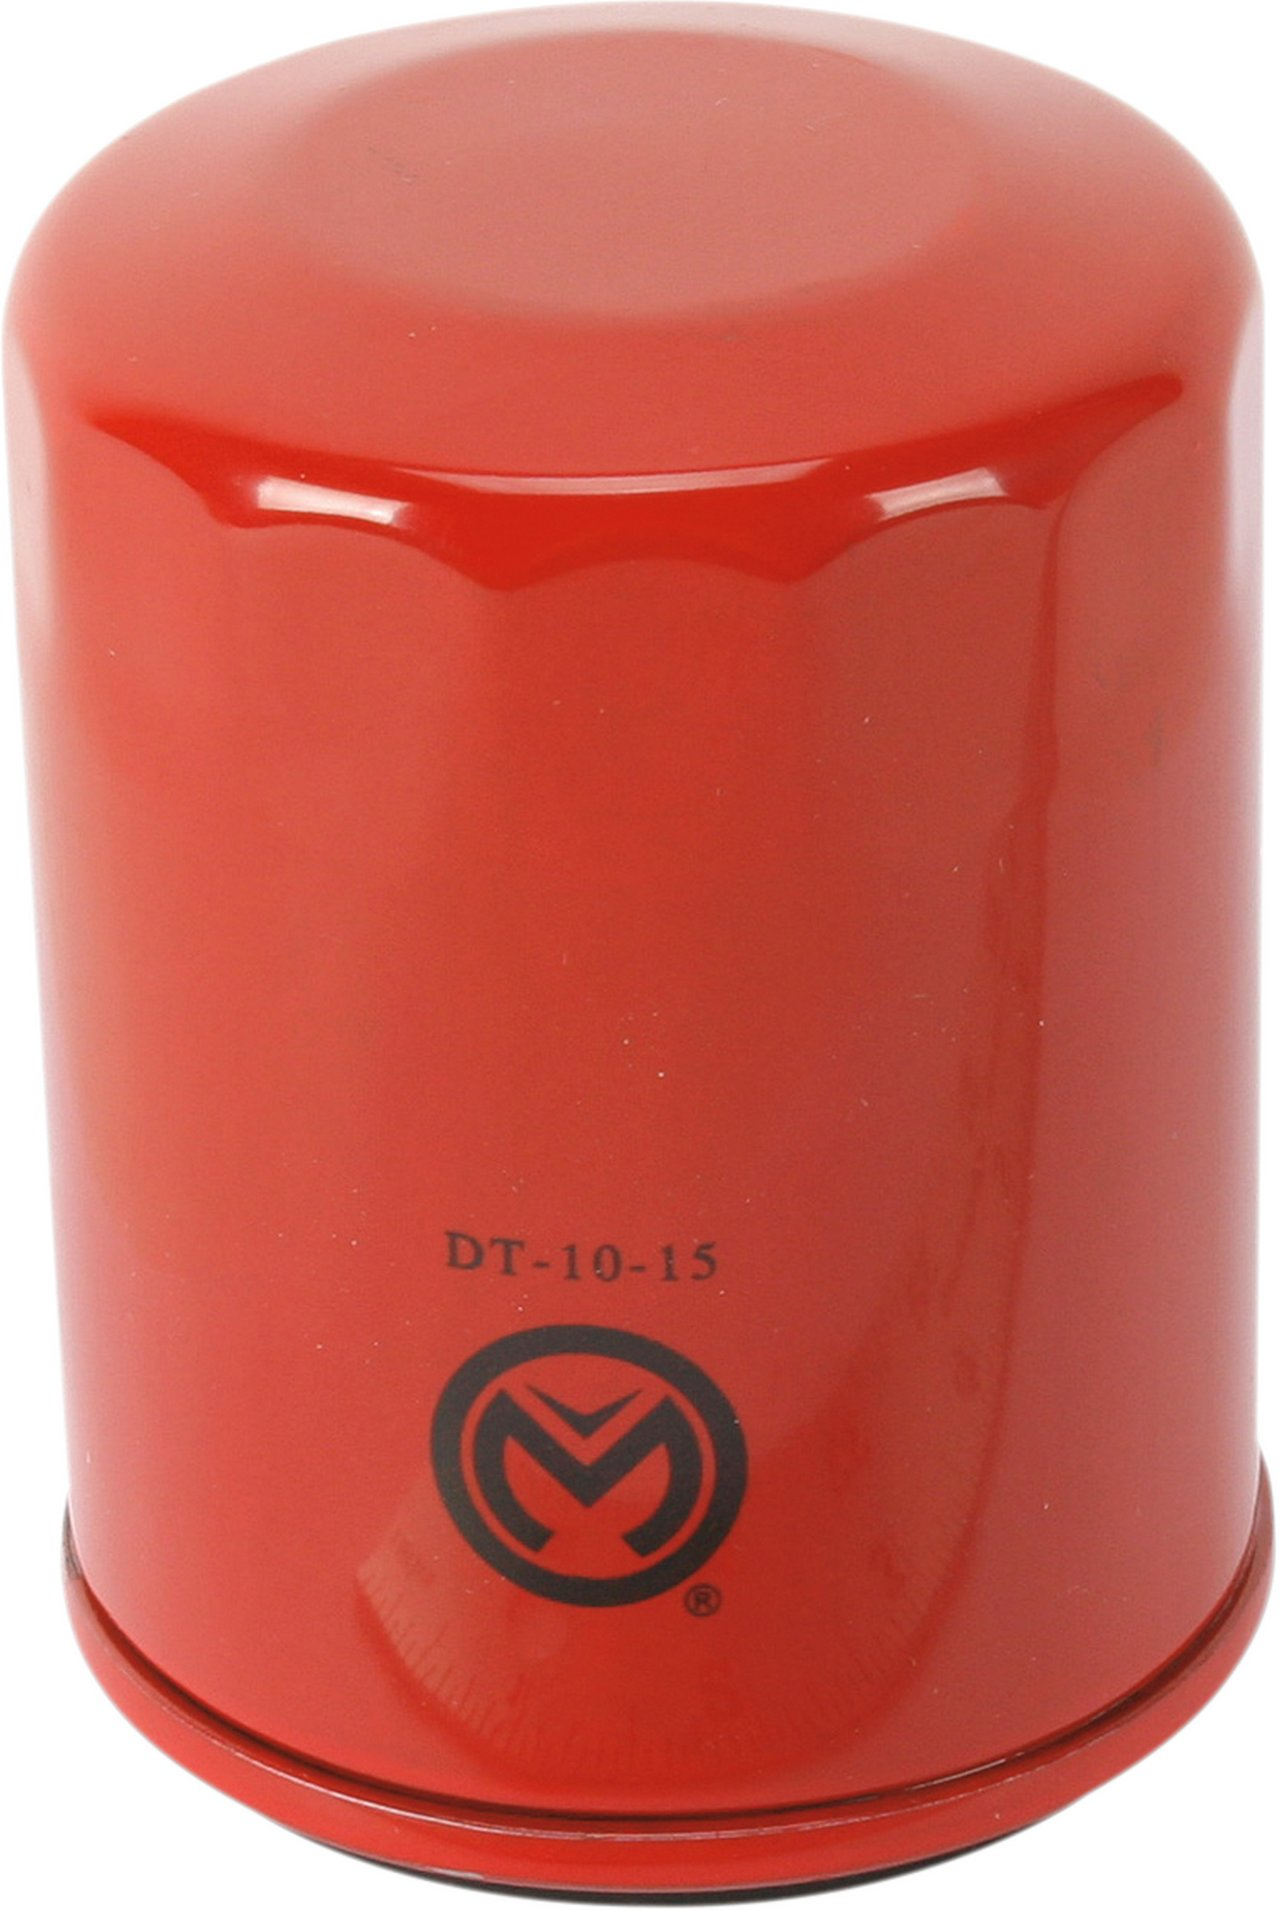 【MOOSE RACING】機油濾芯 [0712-0273] - 「Webike-摩托百貨」